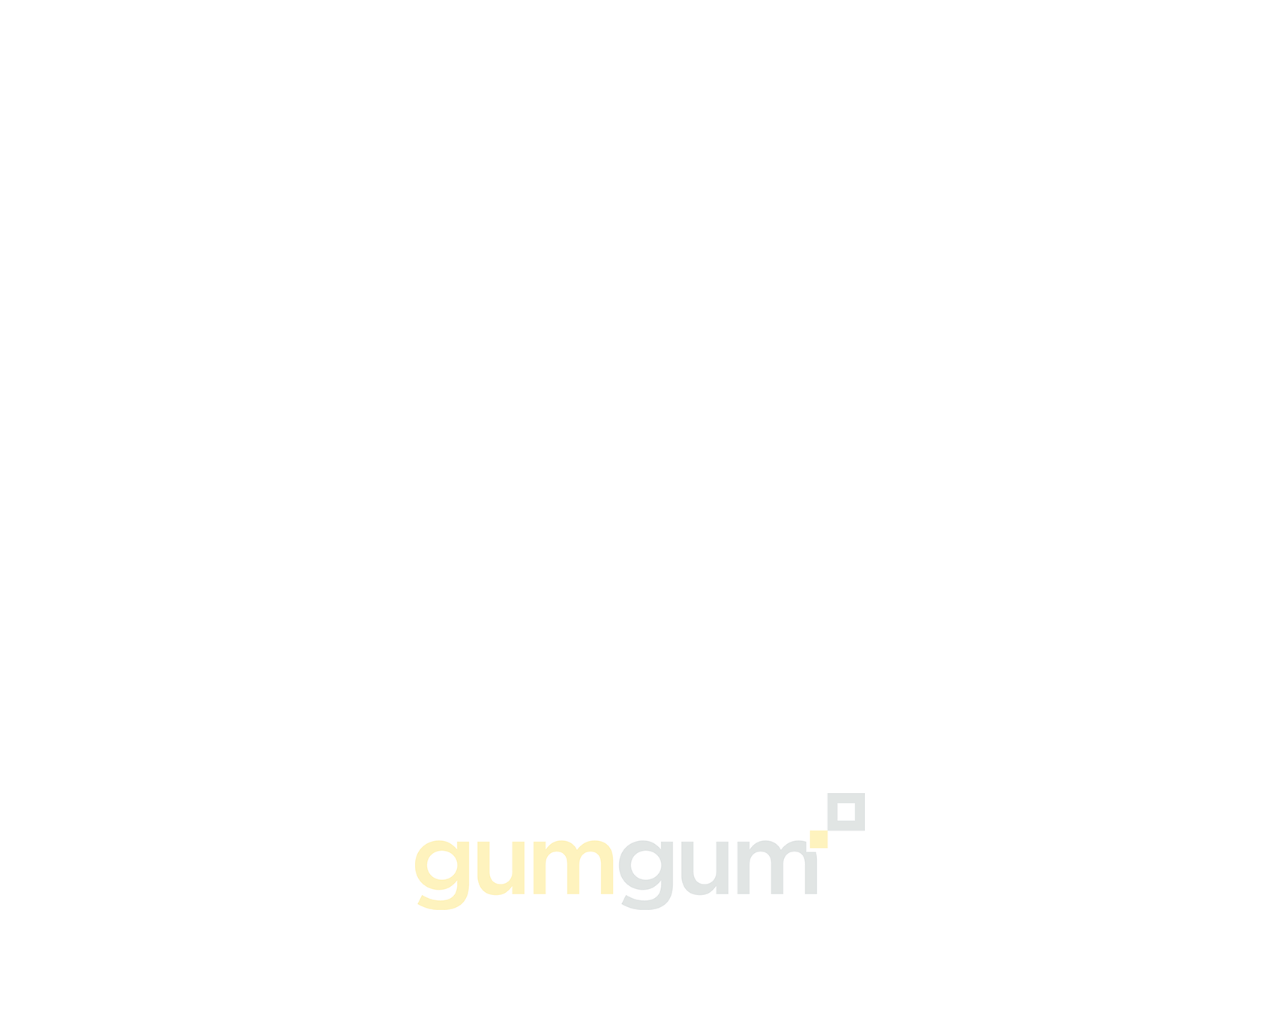 Gum-Gum-Advertising-Reviews-Pricing